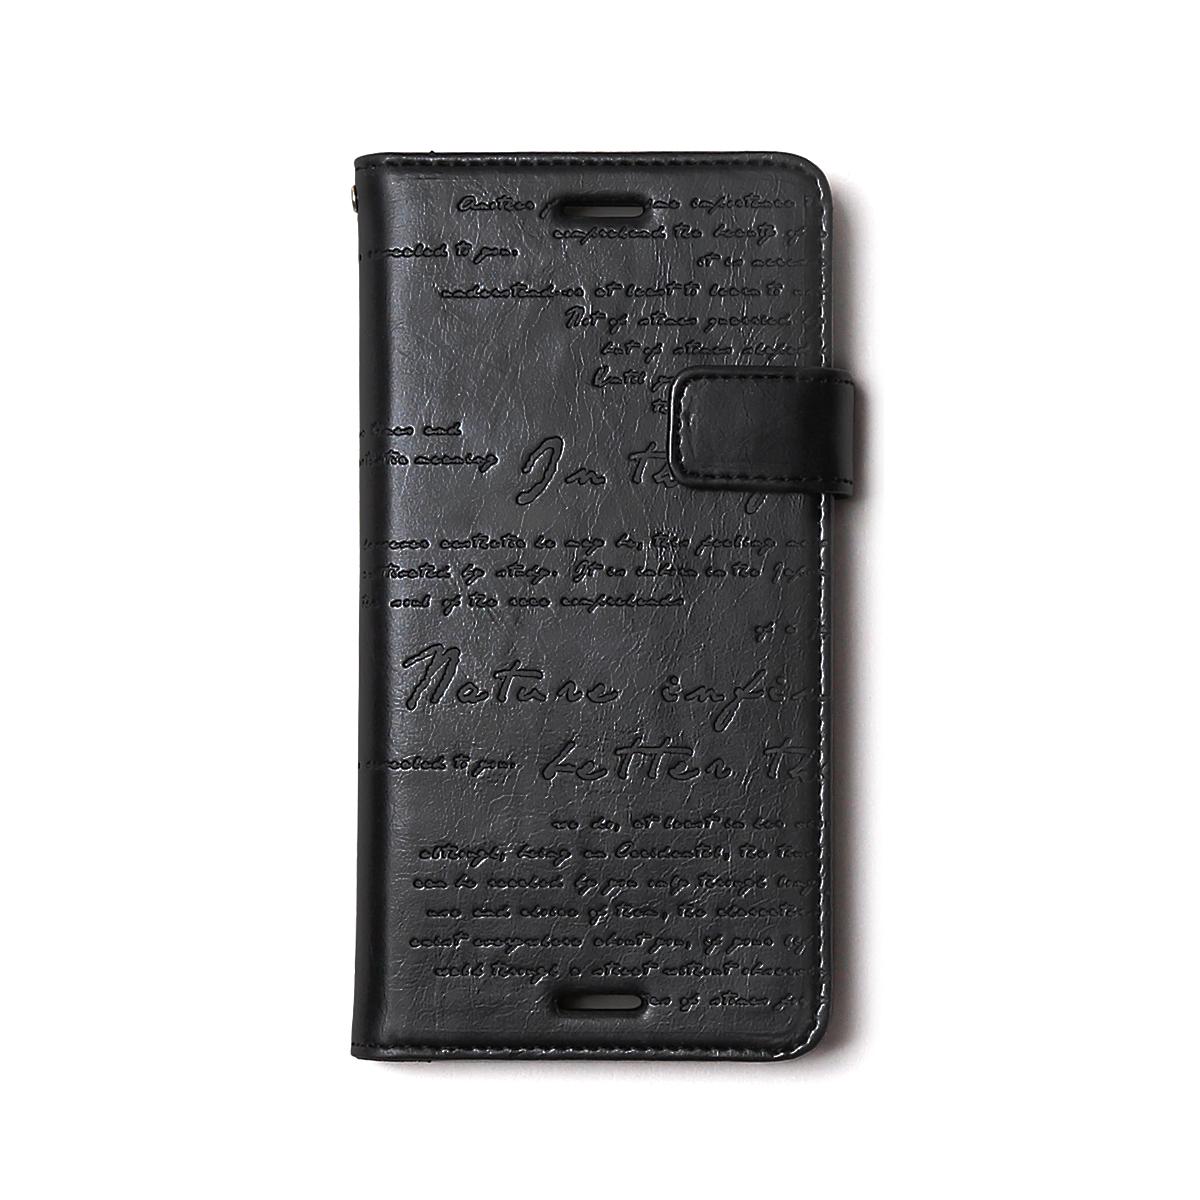 Xperia X Performance ケース 手帳型 ZENUS Lettering Diary(ゼヌス レタリングダイアリー)エクスペリア エックス パフォーマンス SO-04H SOV33 502SO カバー